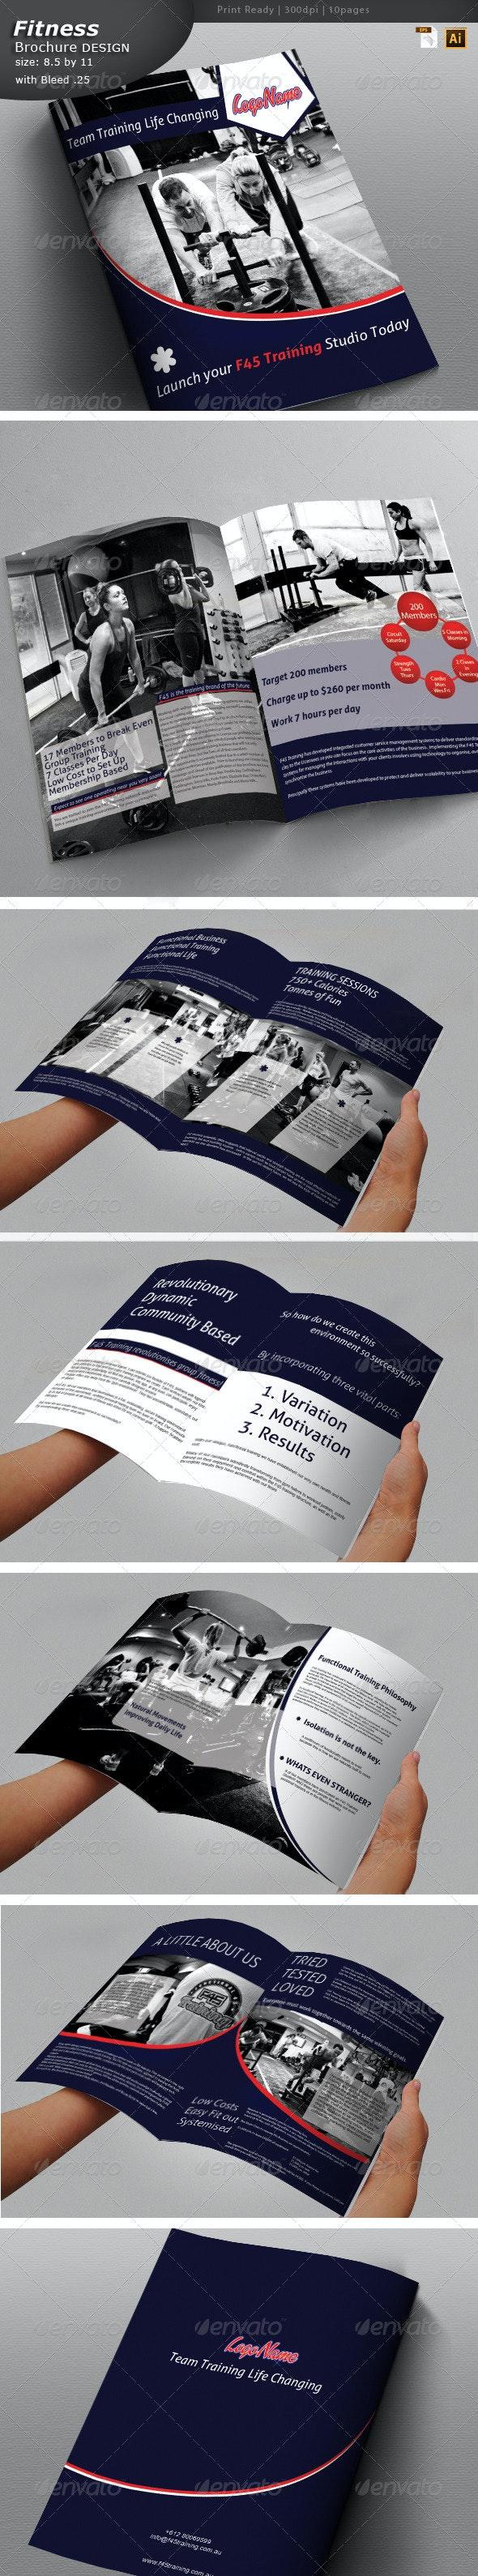 Fitness Training Brochure - Brochures Print Templates